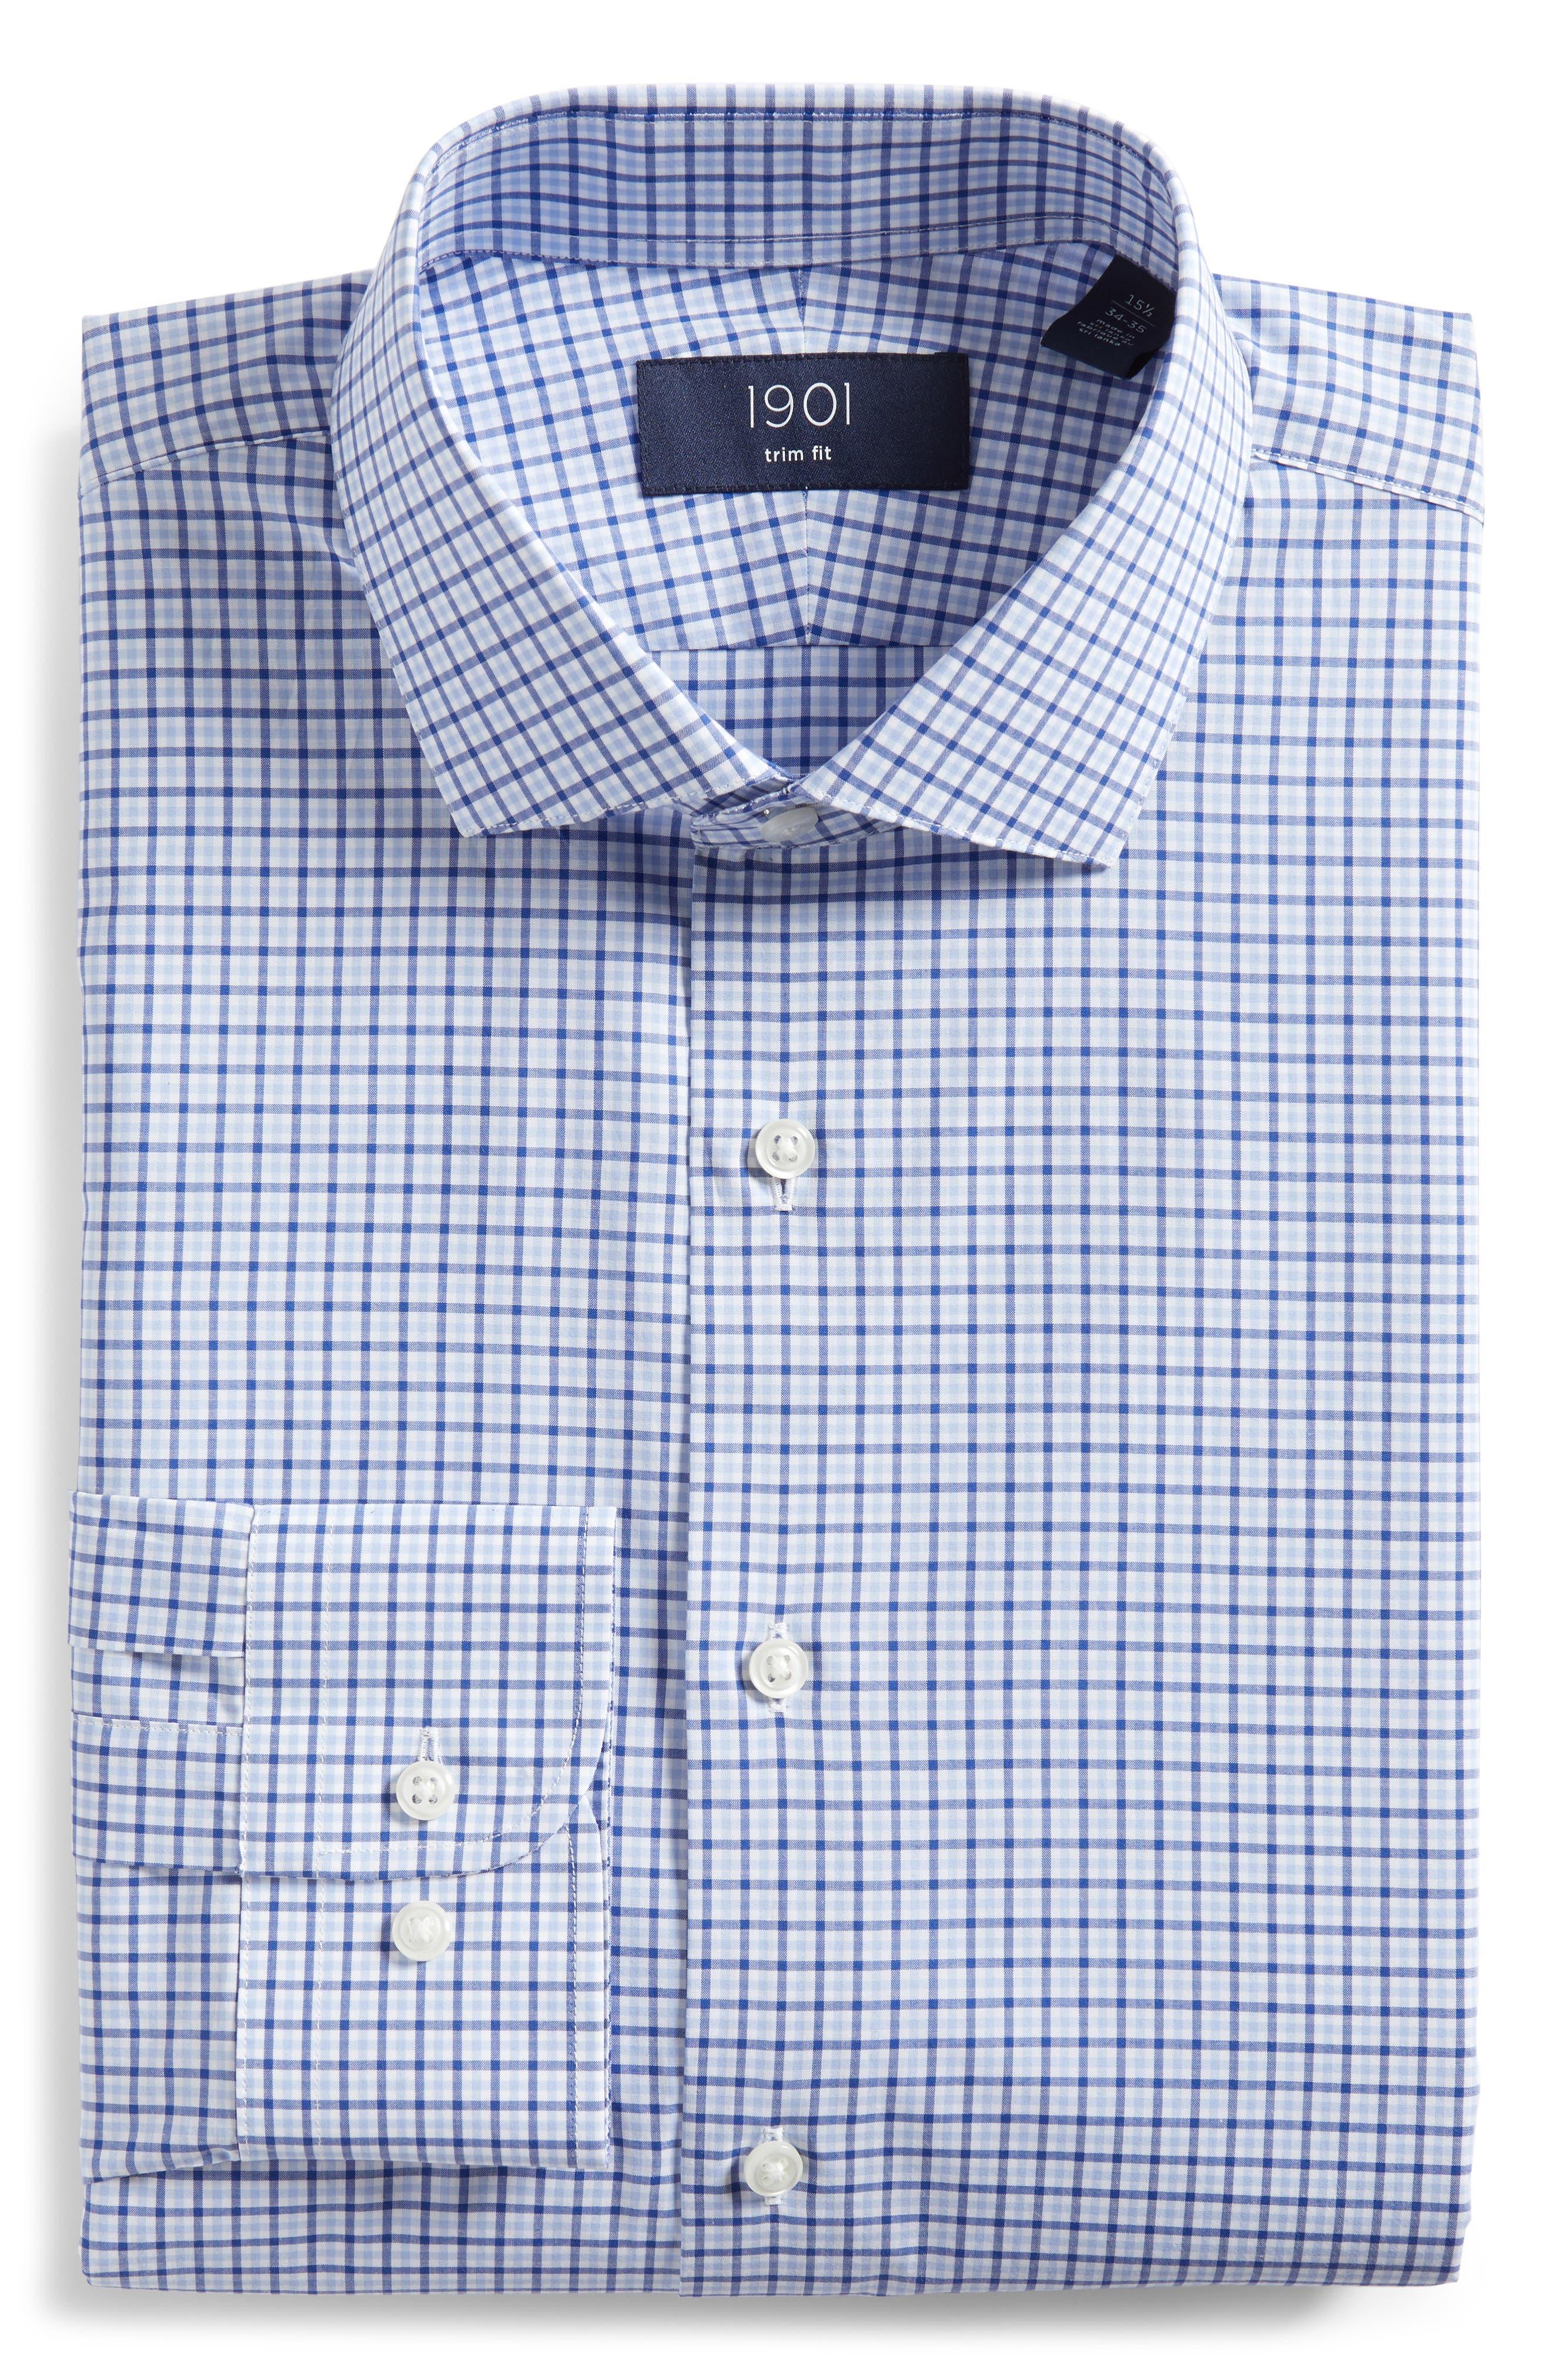 Trim Fit Check Dress Shirt,                             Alternate thumbnail 5, color,                             BLUE SODALITE